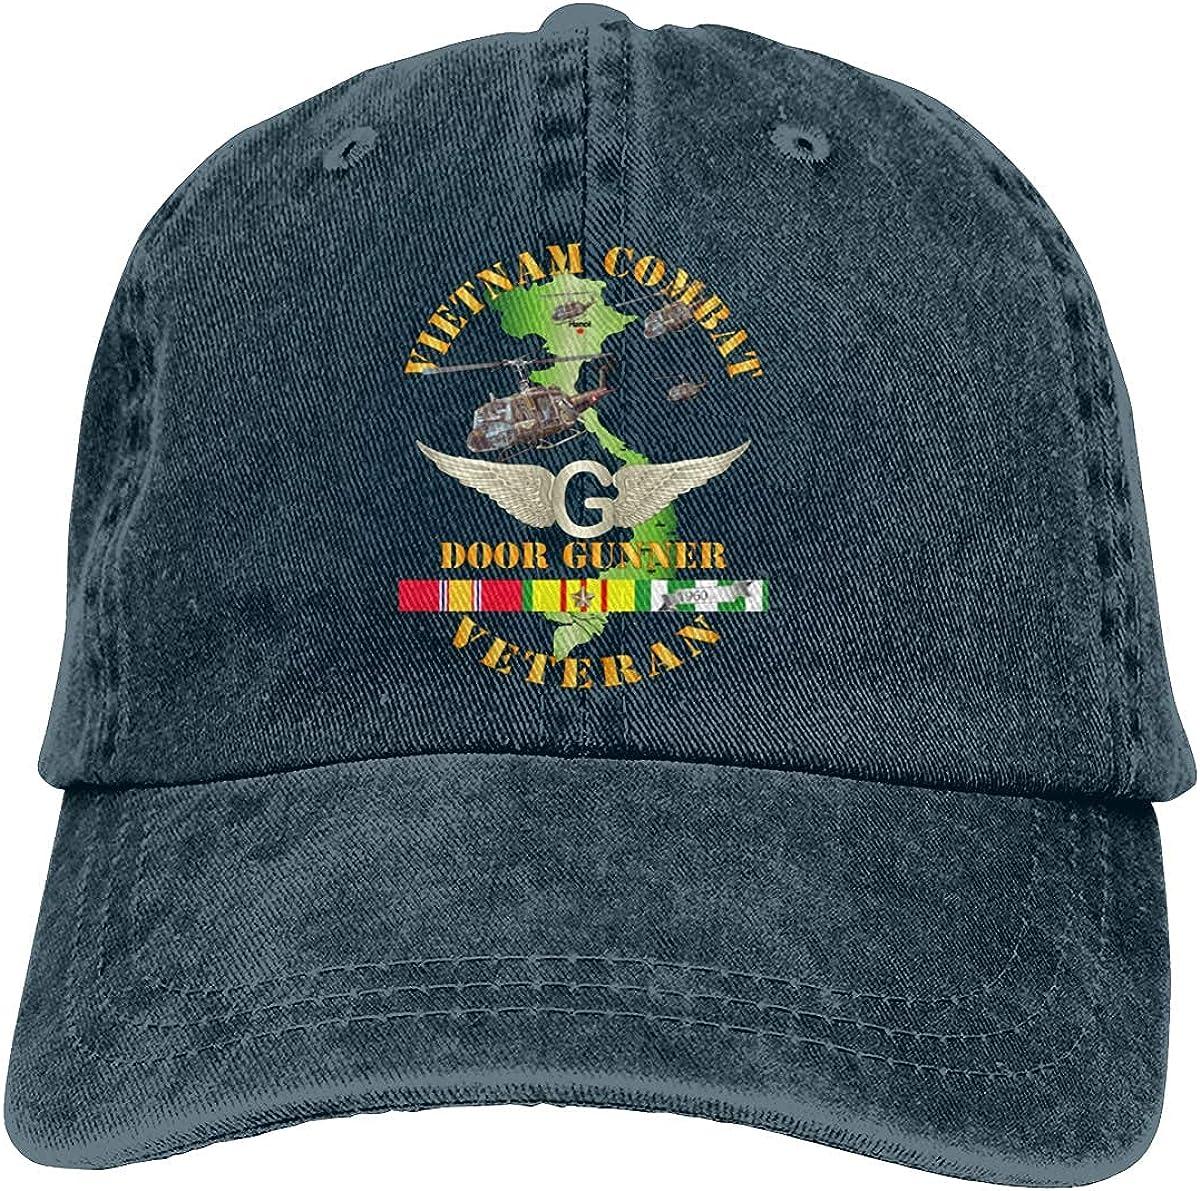 Vietnam Combat Avn Vet Door Gunner Air Assault Baseball Cap, Adjustable Size Dad Hat, Vintage Baseball Hats for Men Woman